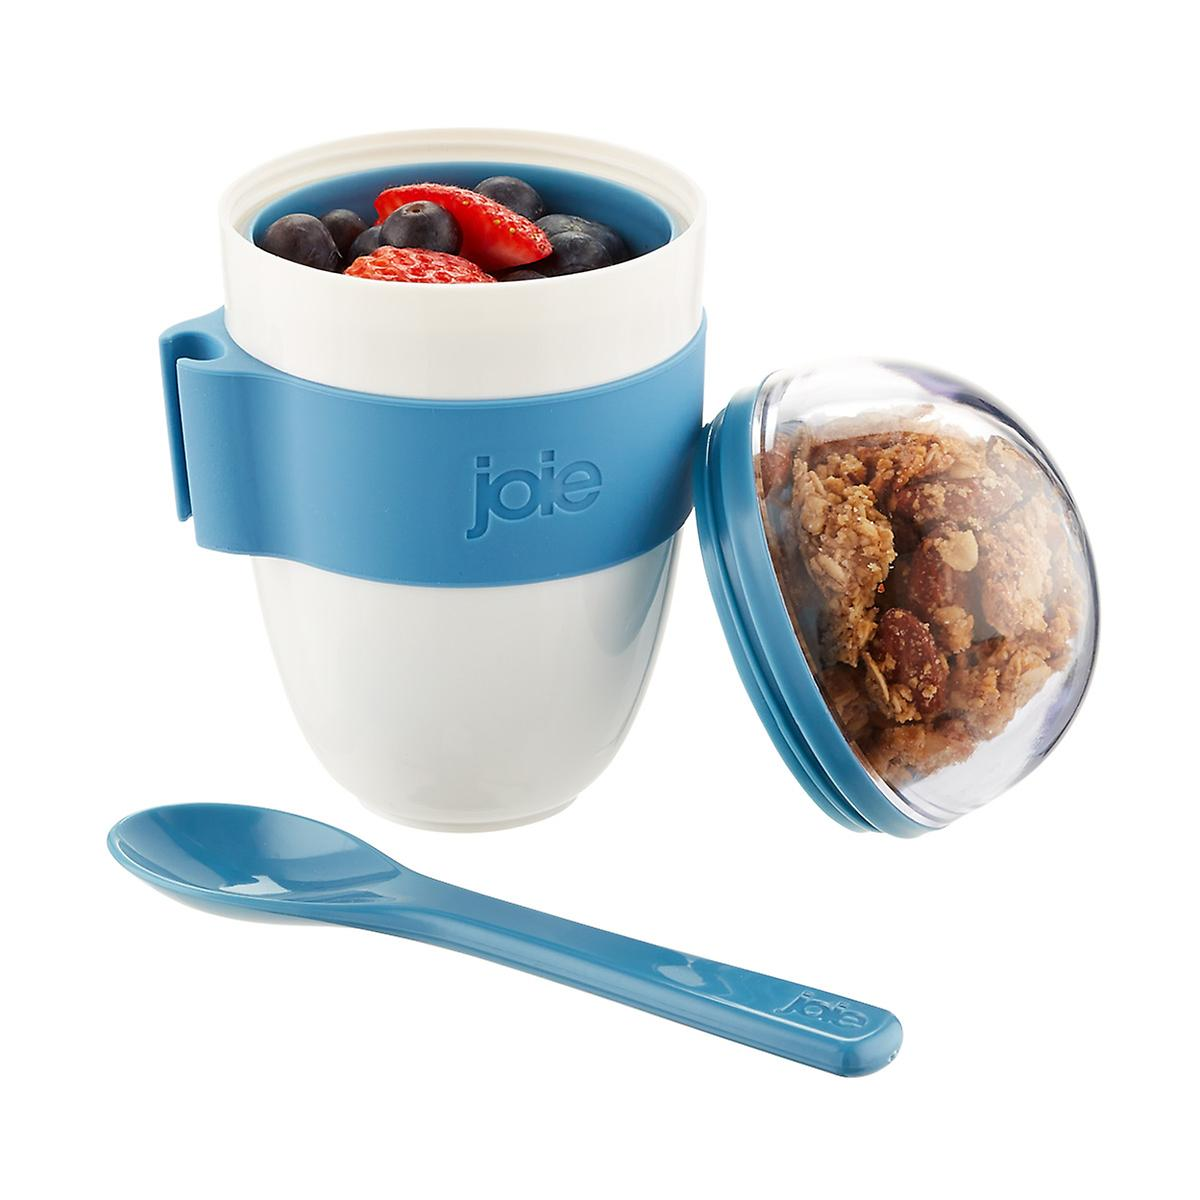 Yogurt-on-the-Go